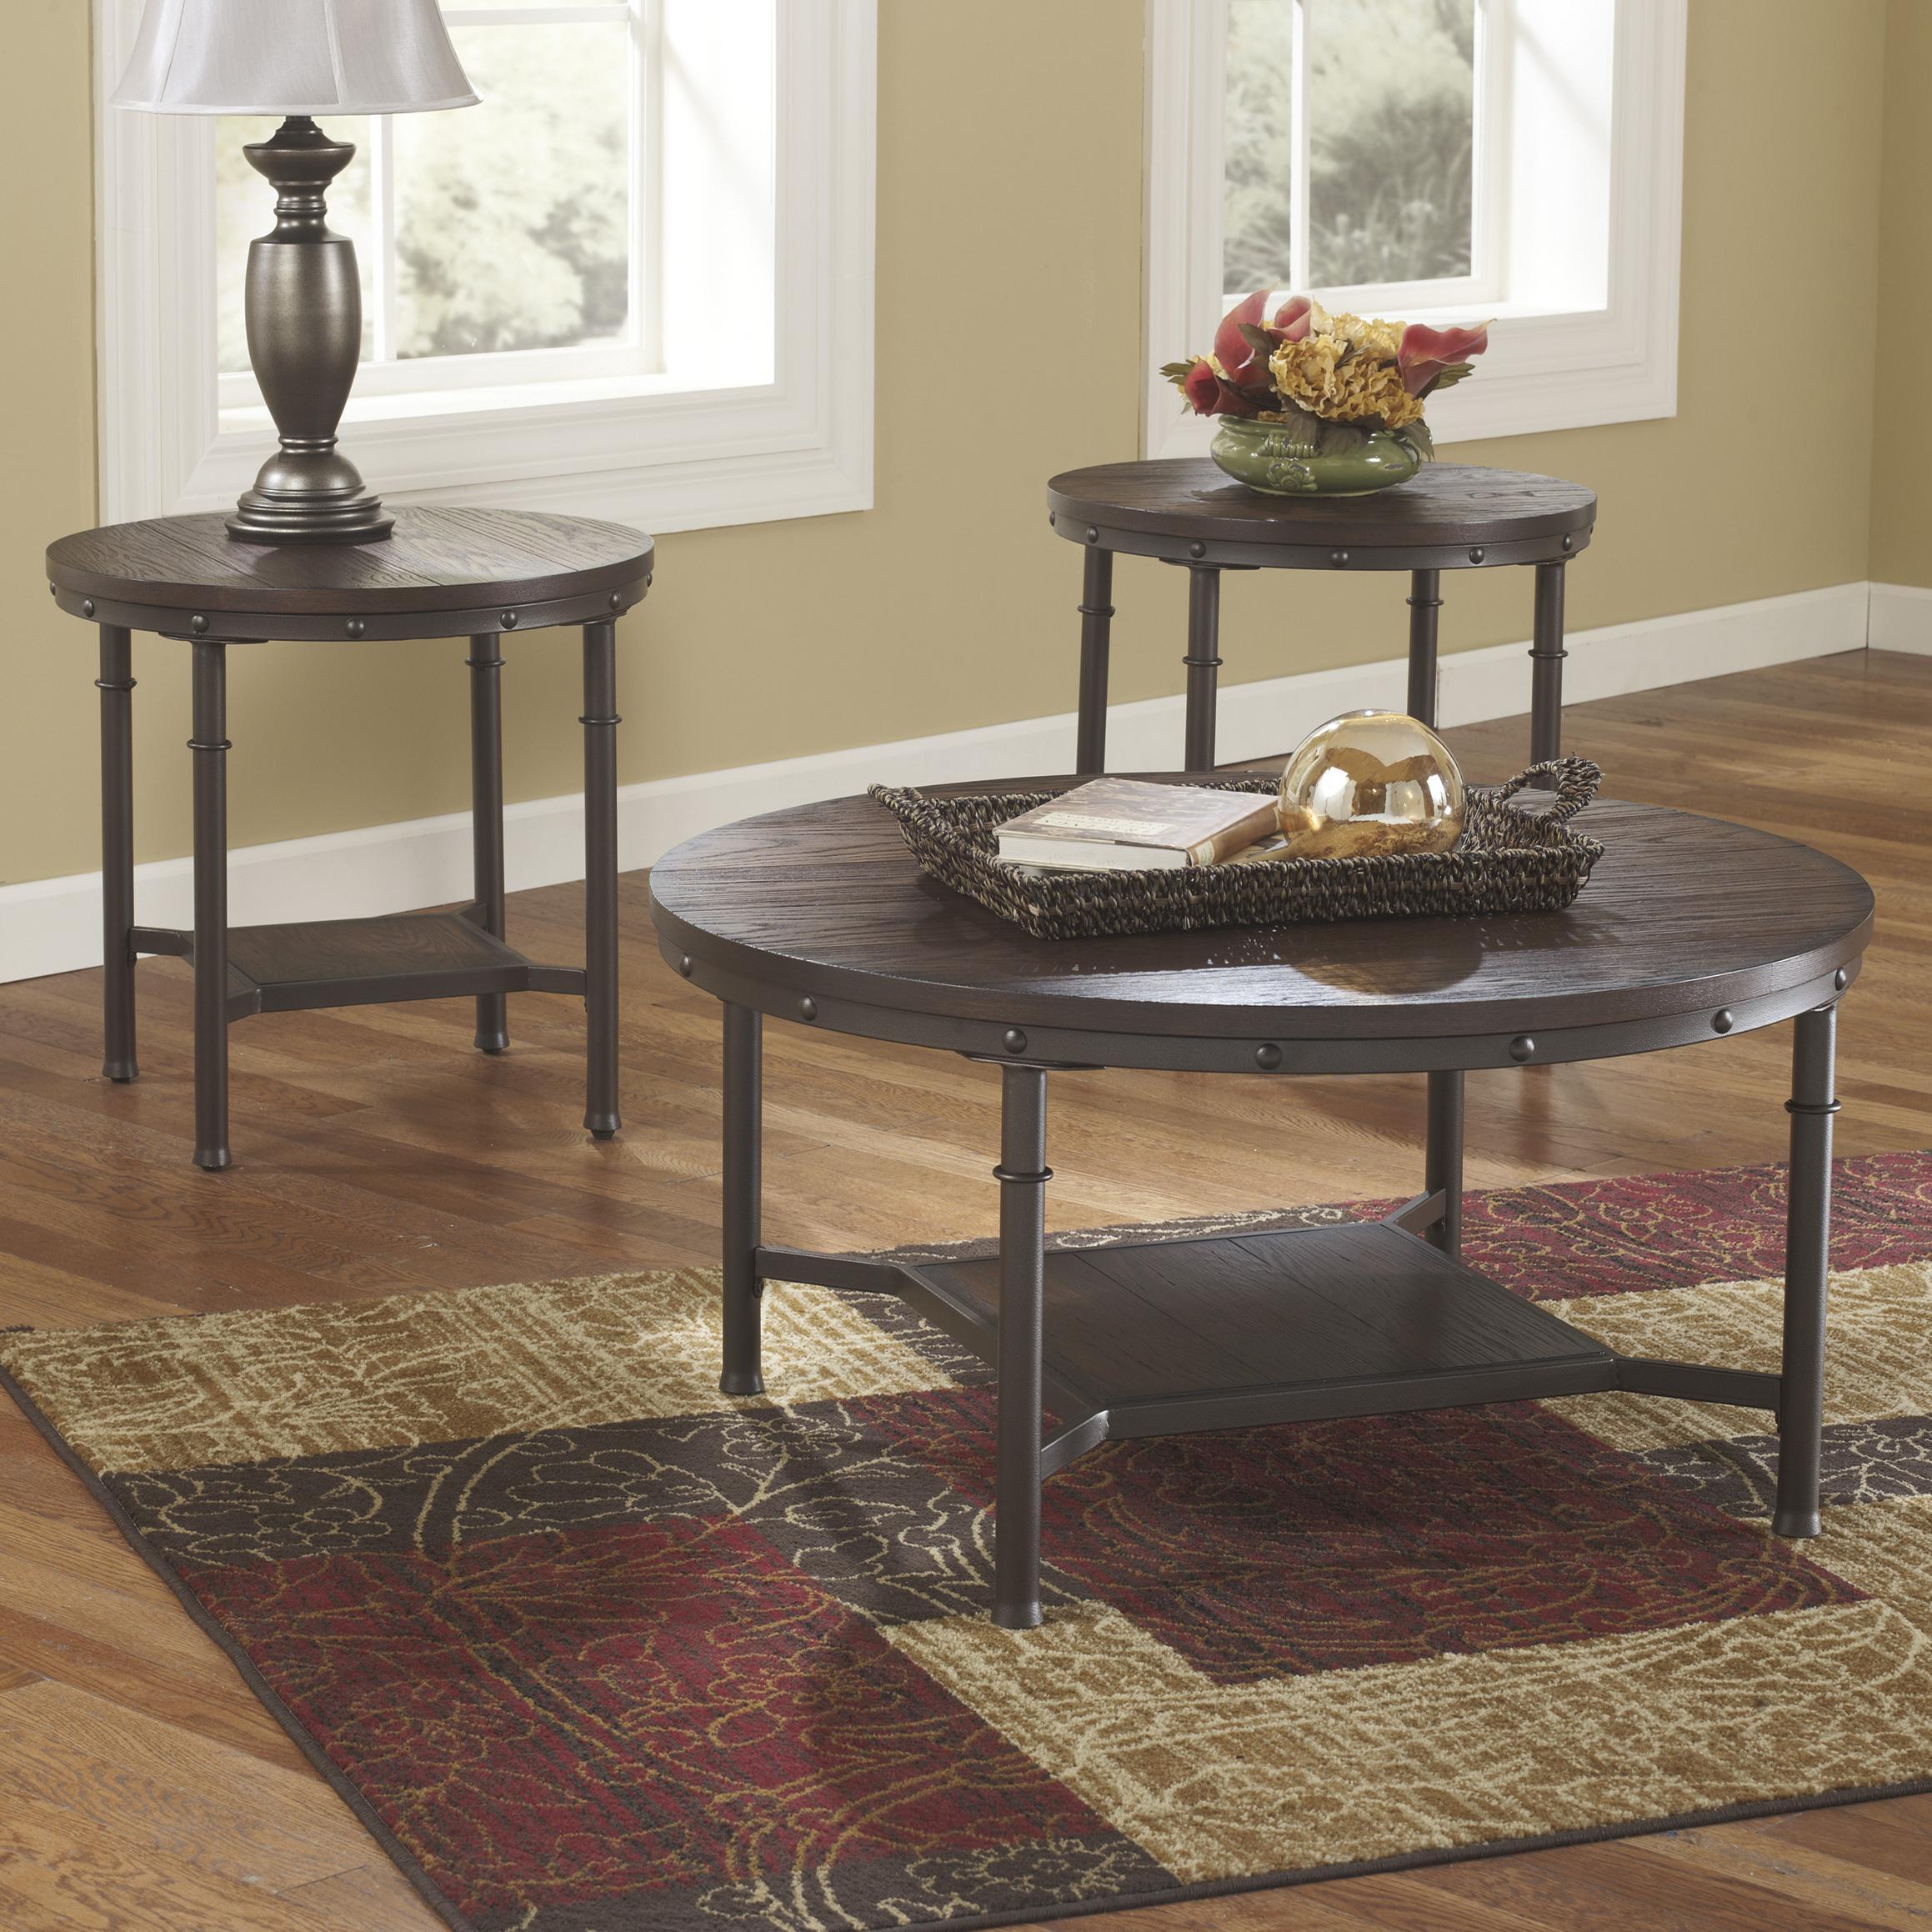 Sandling Occasional Table Set by Ashley (Signature Design) at Johnny Janosik